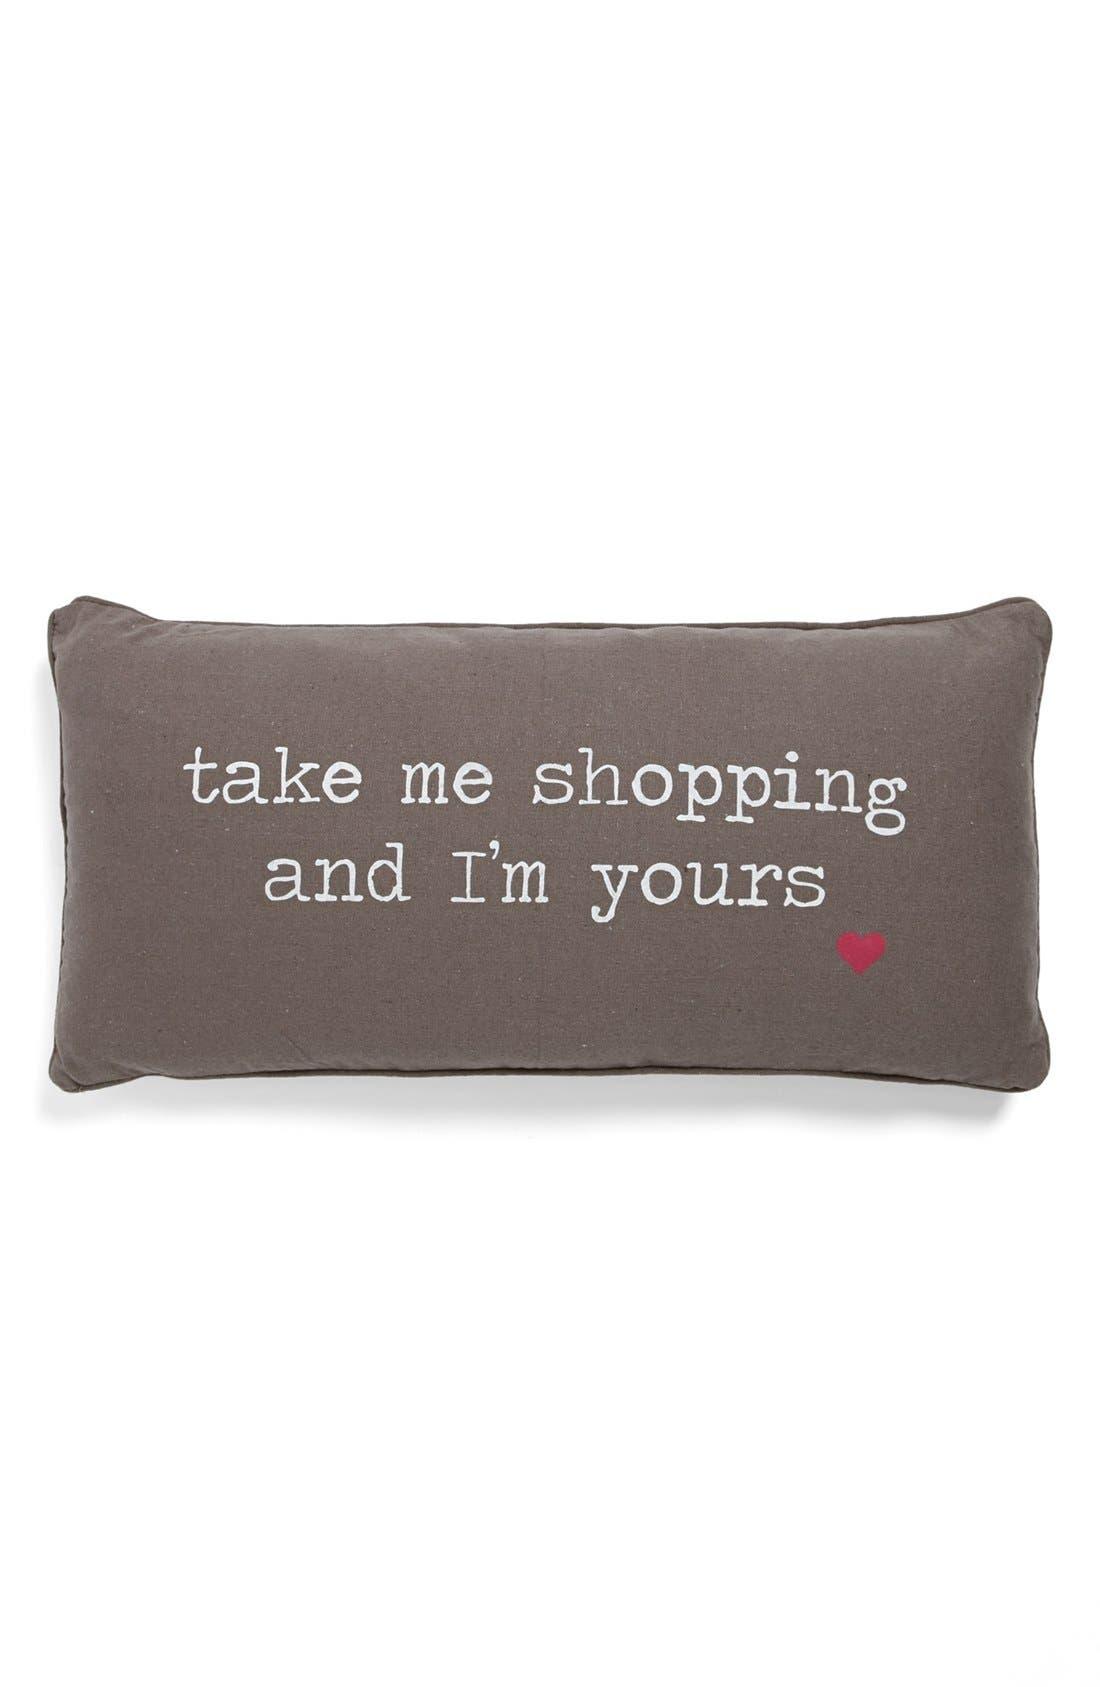 'Take Me Shopping' Pillow,                             Main thumbnail 1, color,                             020